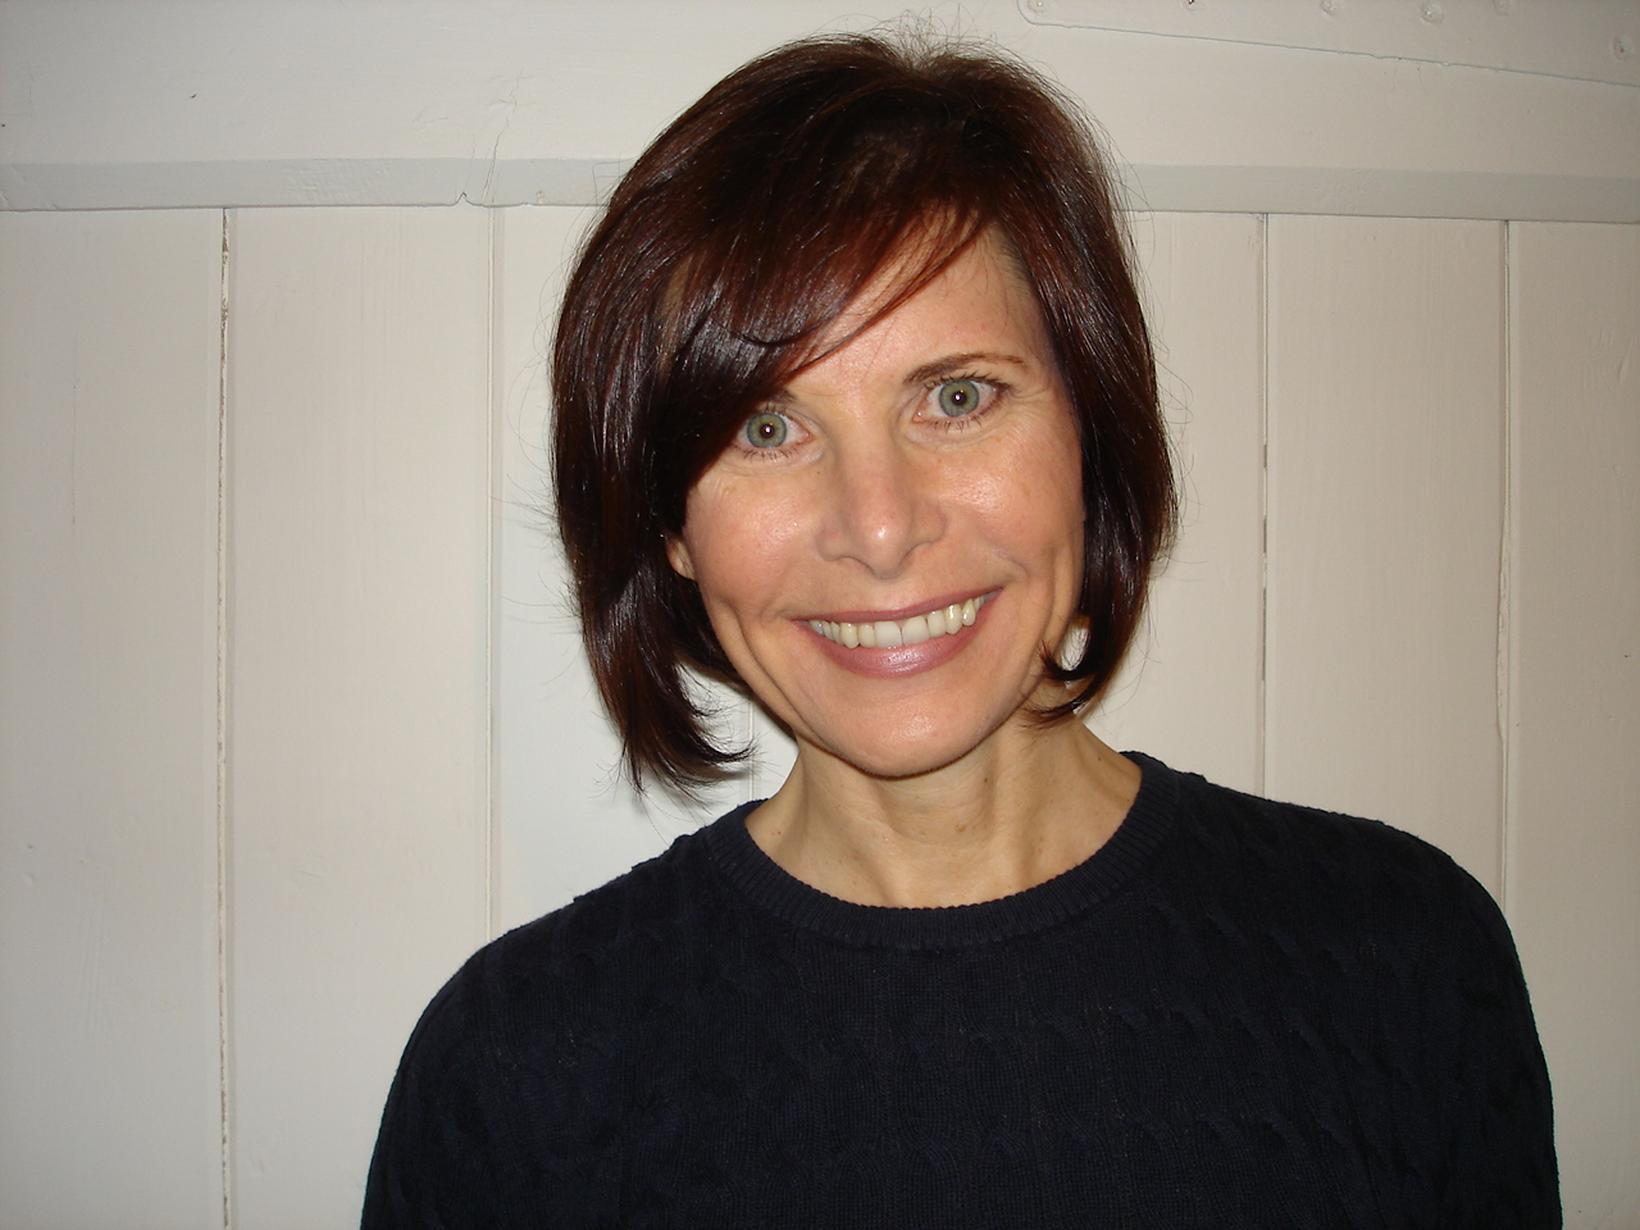 Kathleen from Toronto, Ontario, Canada